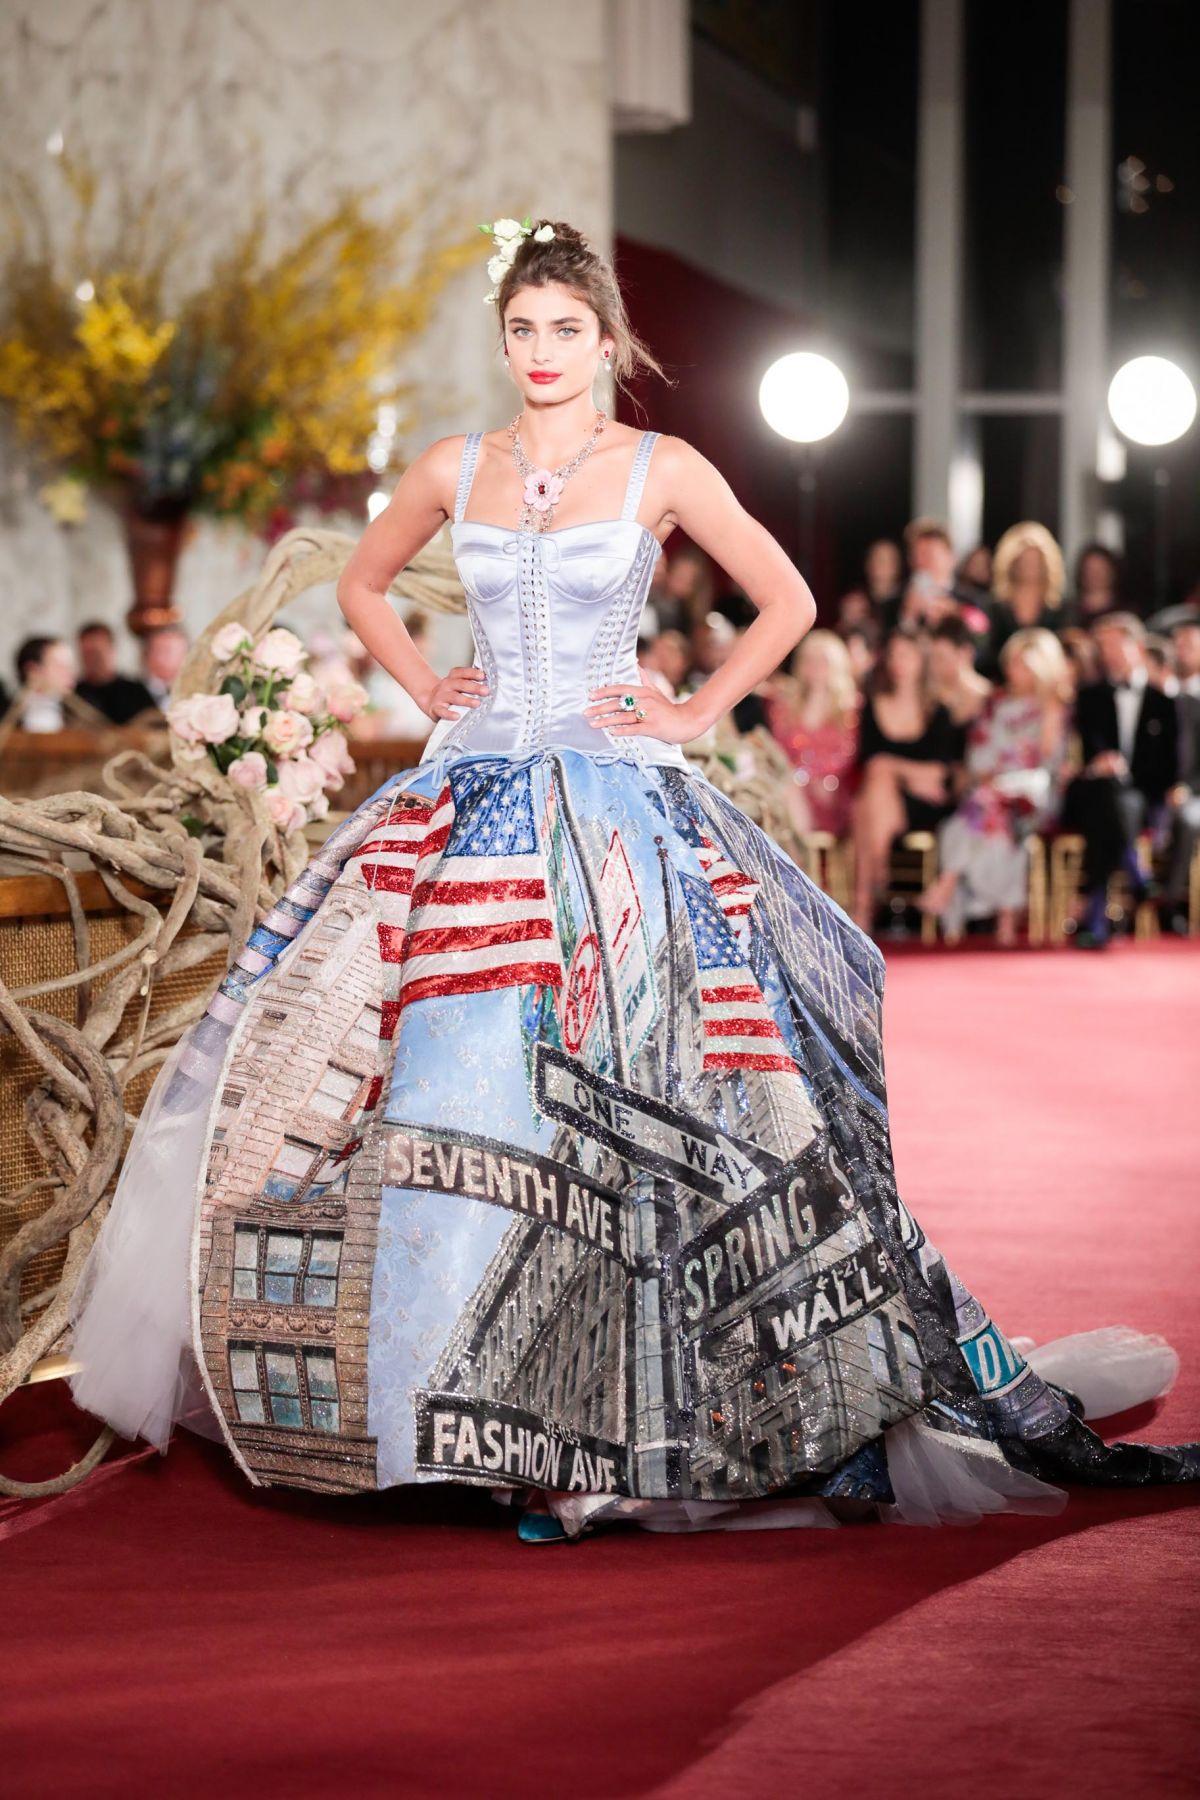 info for 5ab99 1e60c TAYLOR HILL at Dolce & Gabbana Alta Moda Fashion Show in New ...